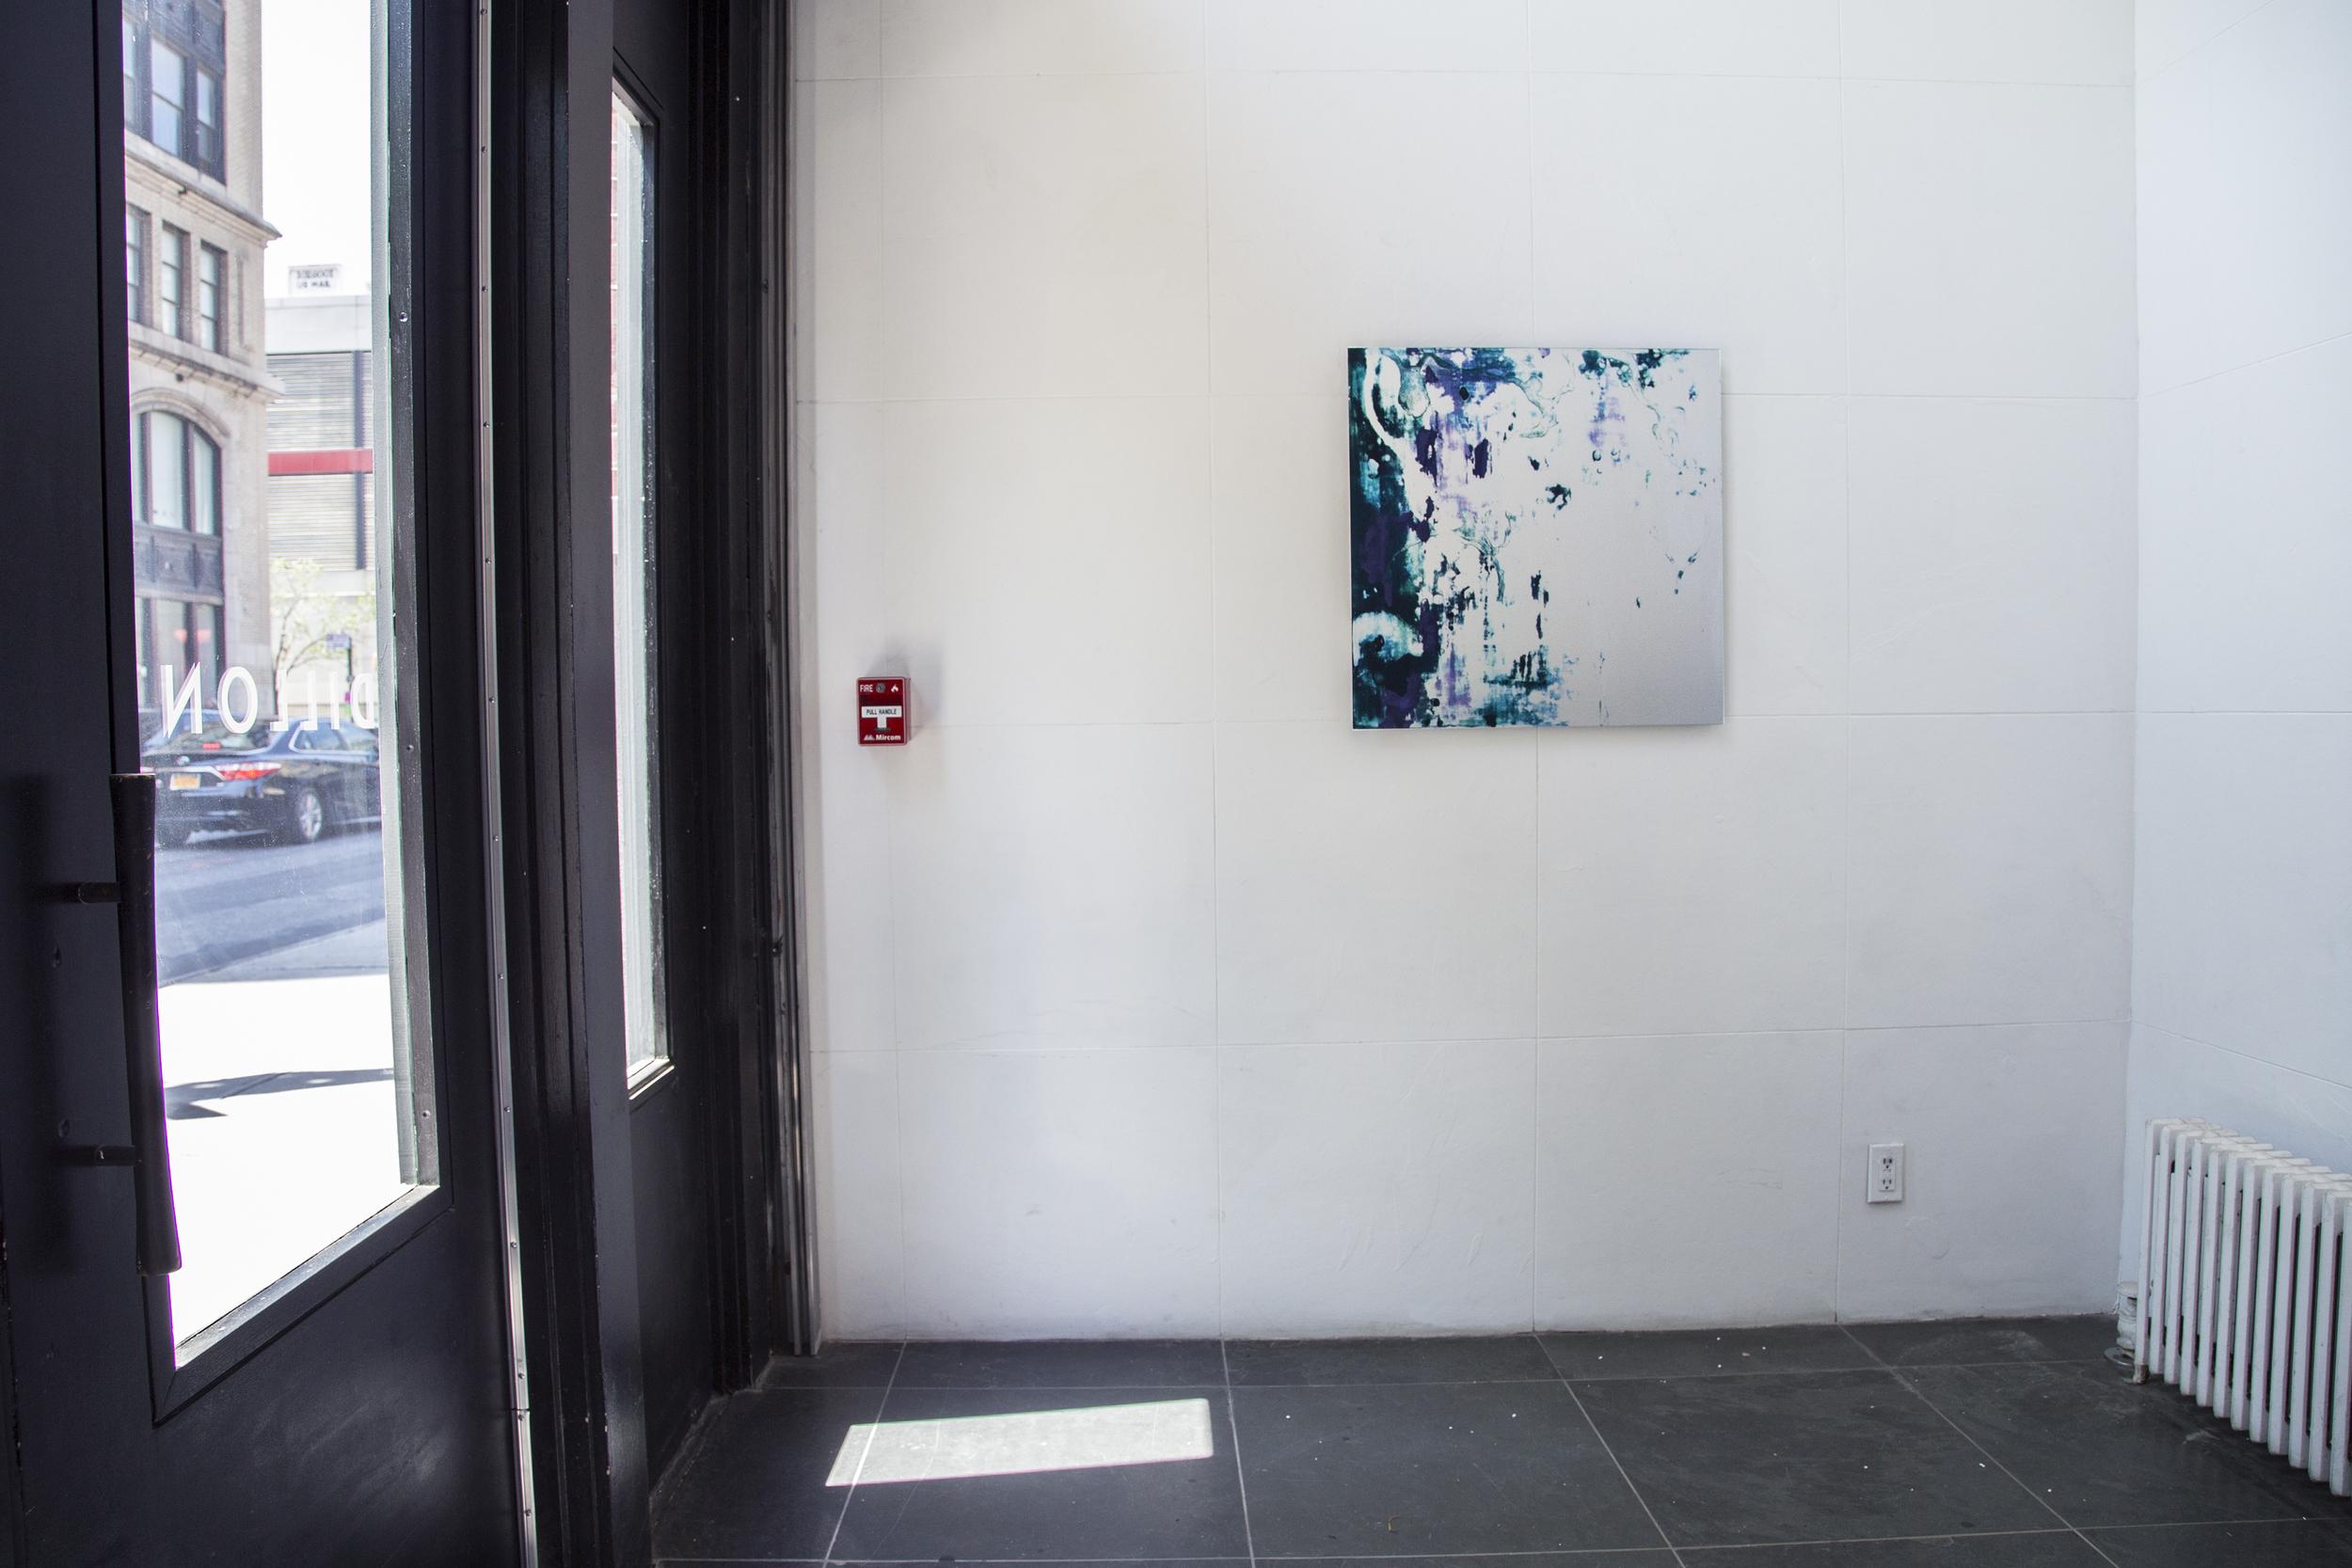 Dillon_Gallery_Yuzu_Ono_Art_Chelsea_Manhattan.jpg